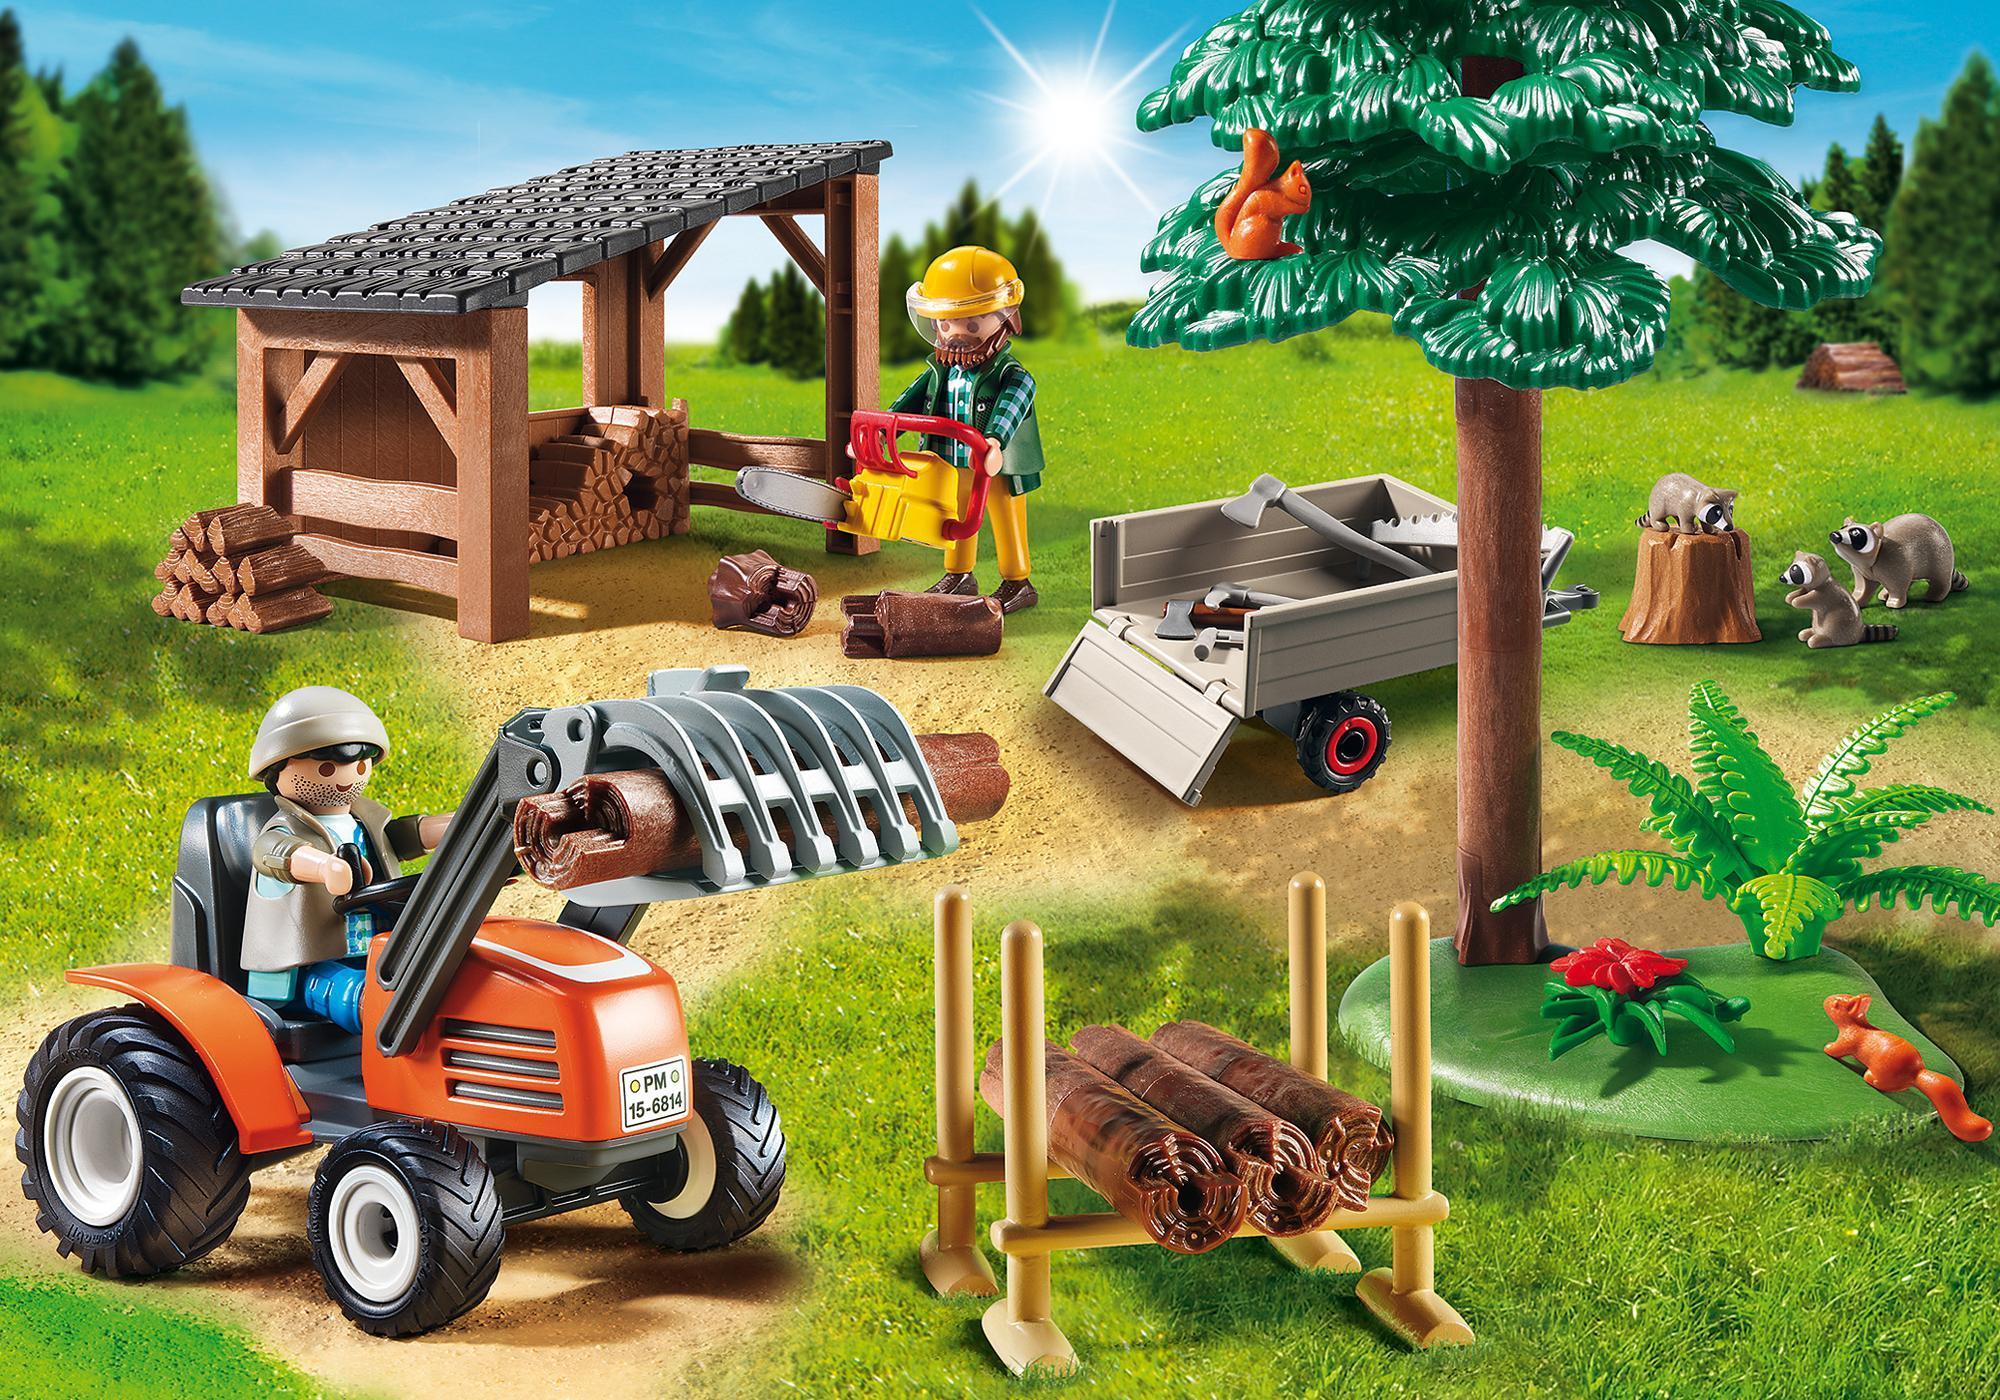 6814_product_detail/Drwal z traktorem